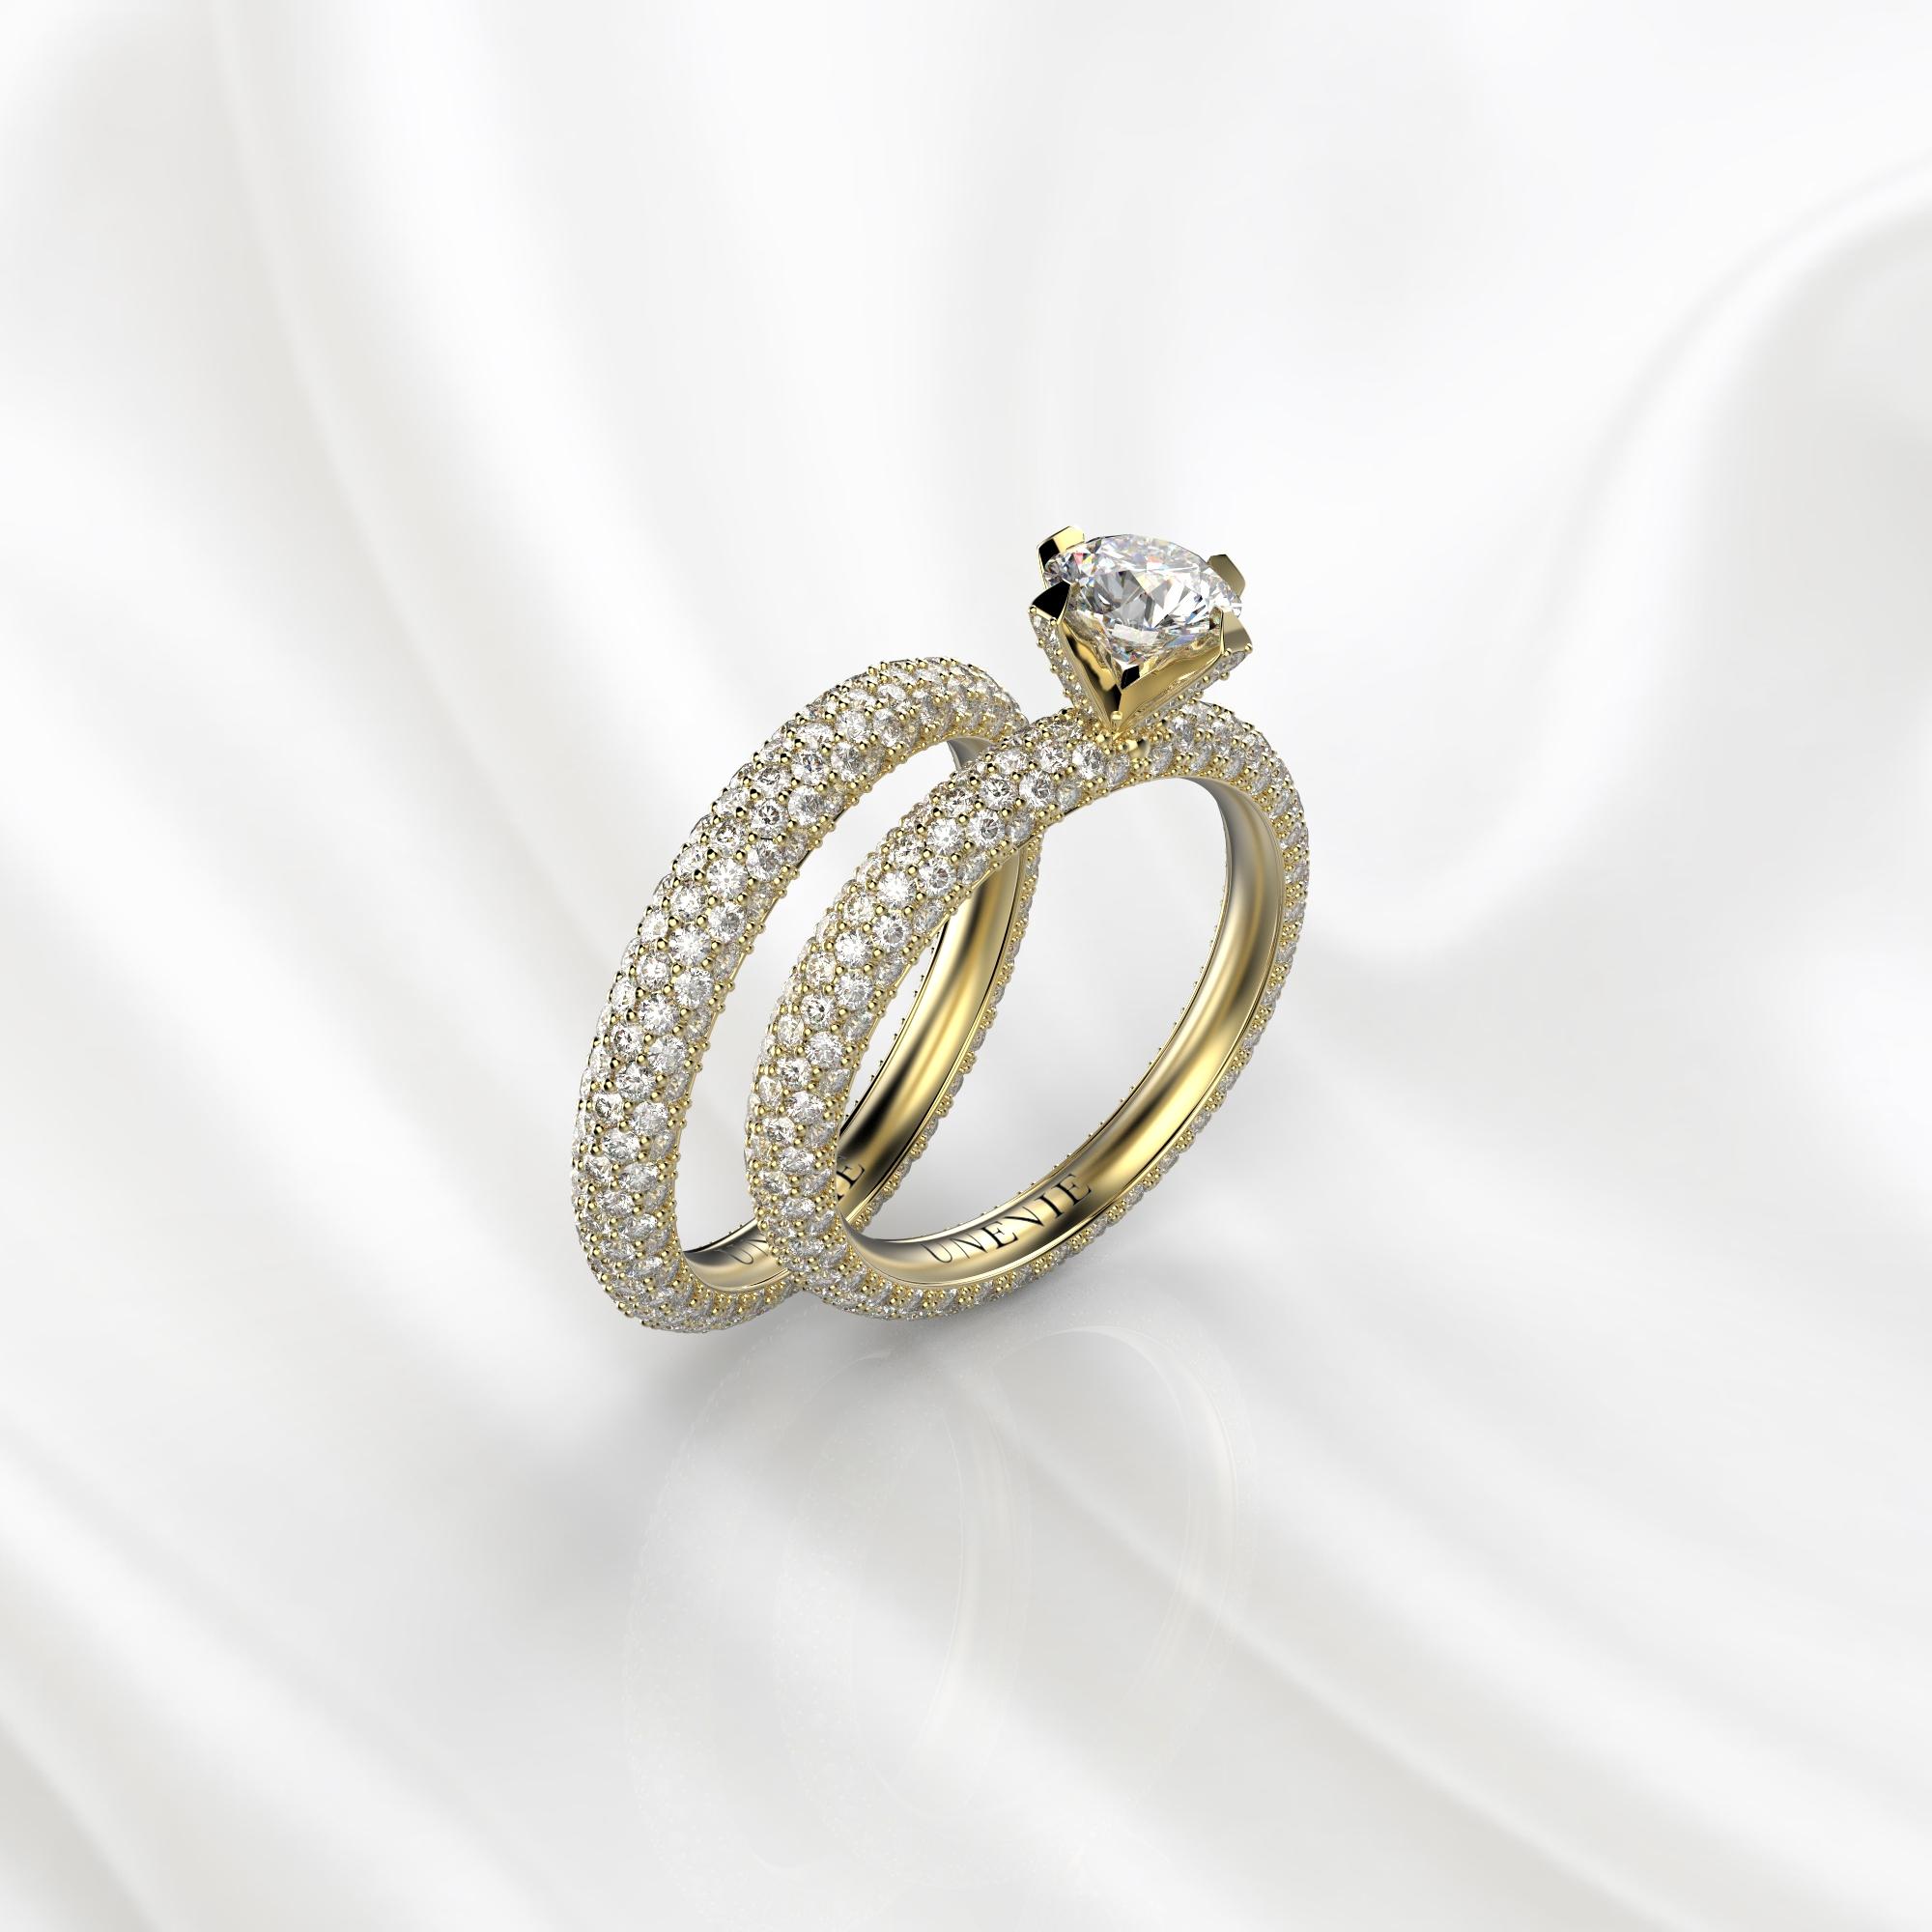 N26 Сет колец для помолвки из желтого золота с бриллиантами